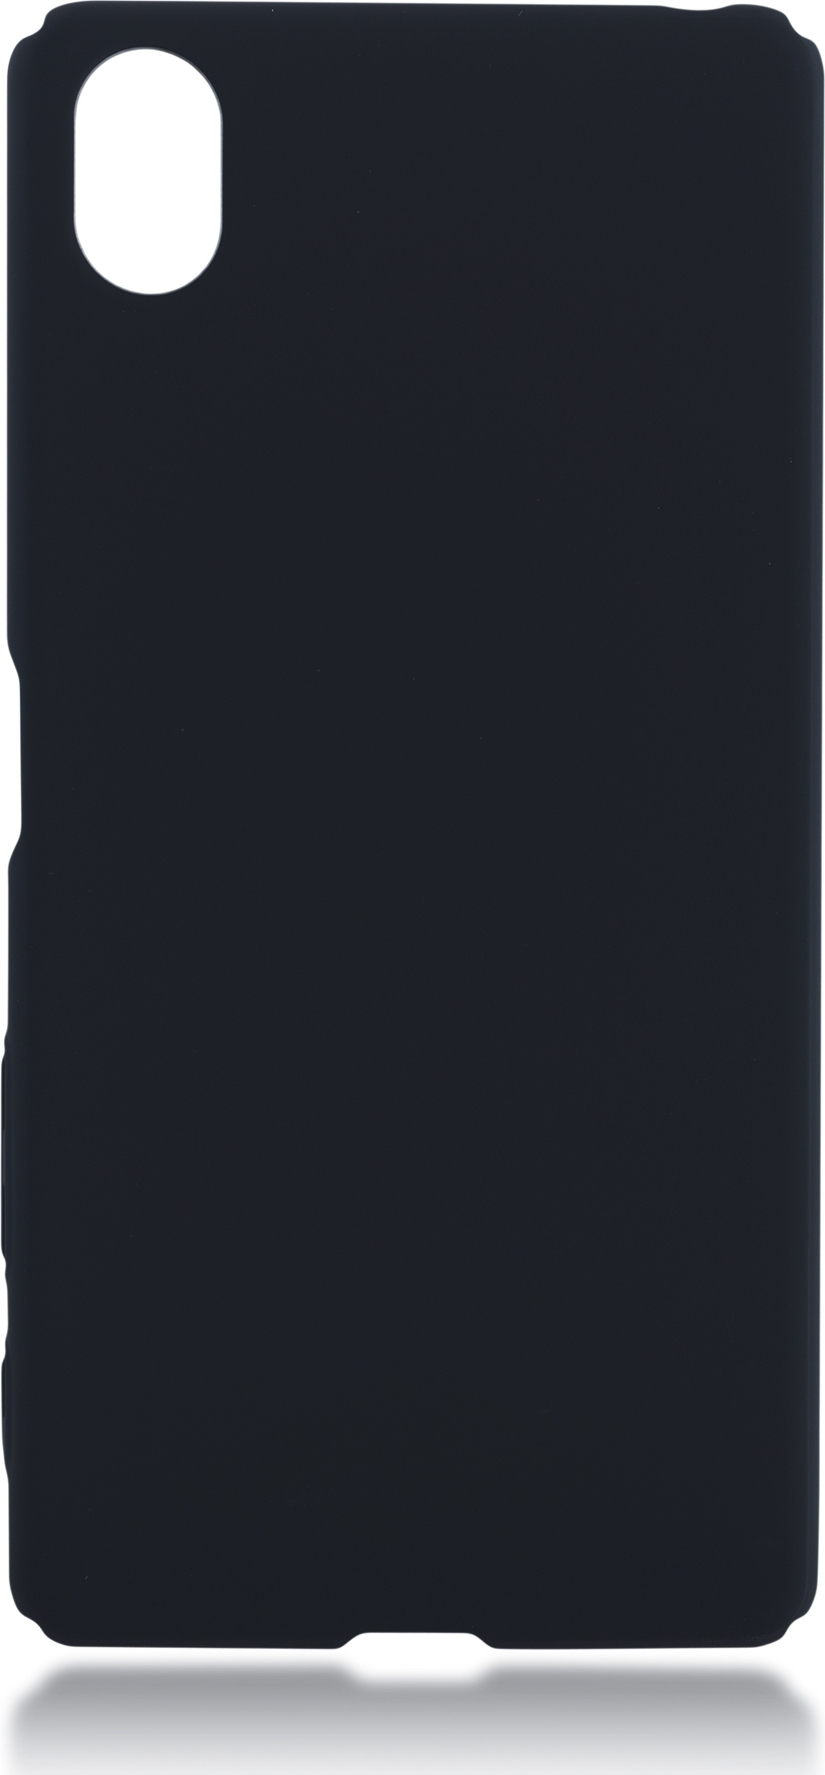 Чехол Brosco 4Side Soft-Touch для Sony Xperia X Perfomance, черный чехол для sony i4213 xperia 10 plus brosco силиконовая накладка черный